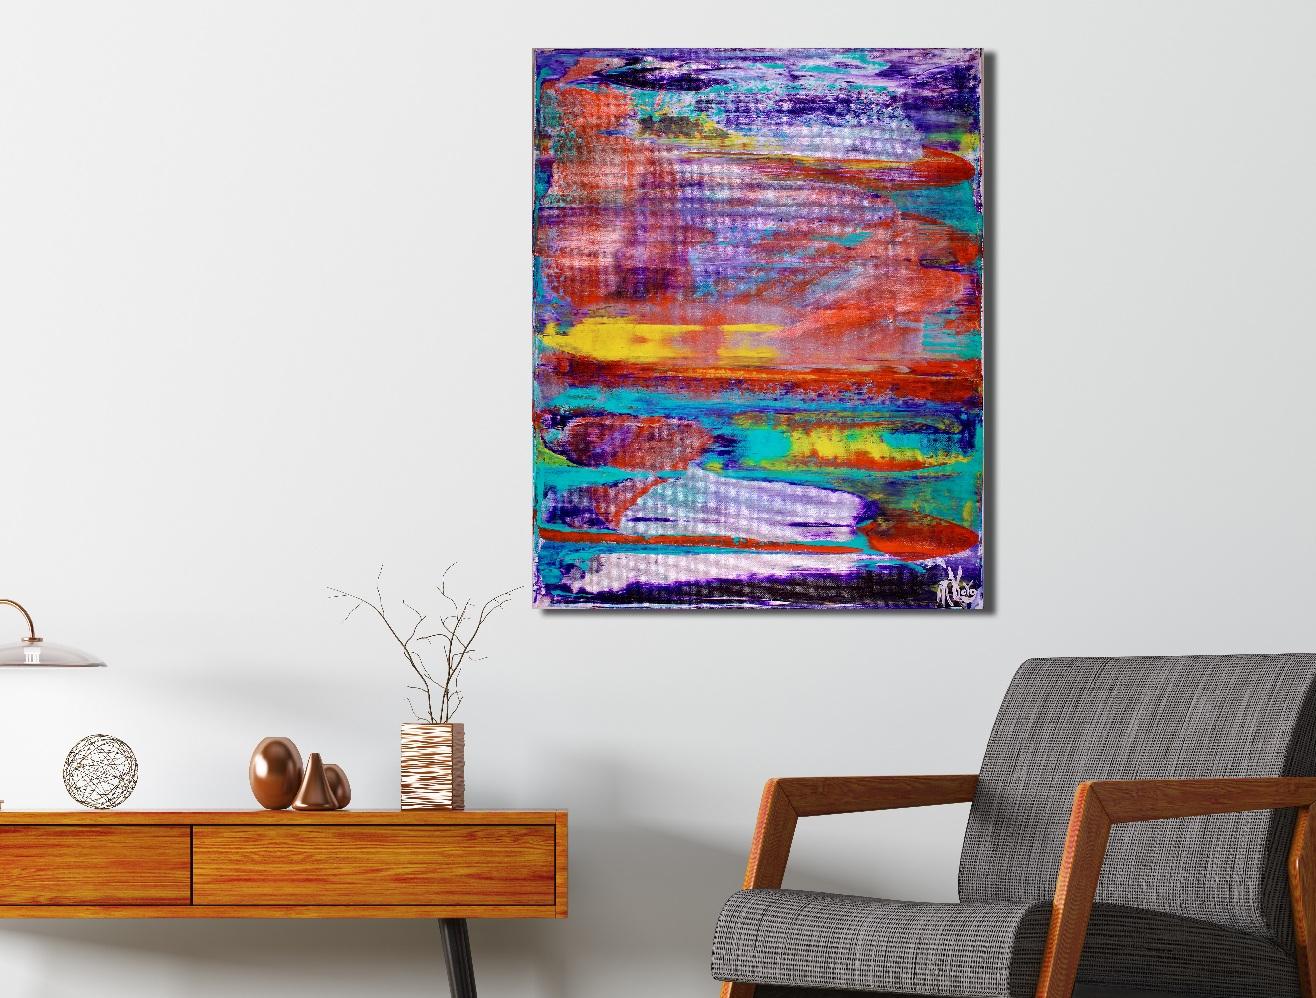 Energy Fusion 3 (2018) Acrylic painting by Nestor Toro